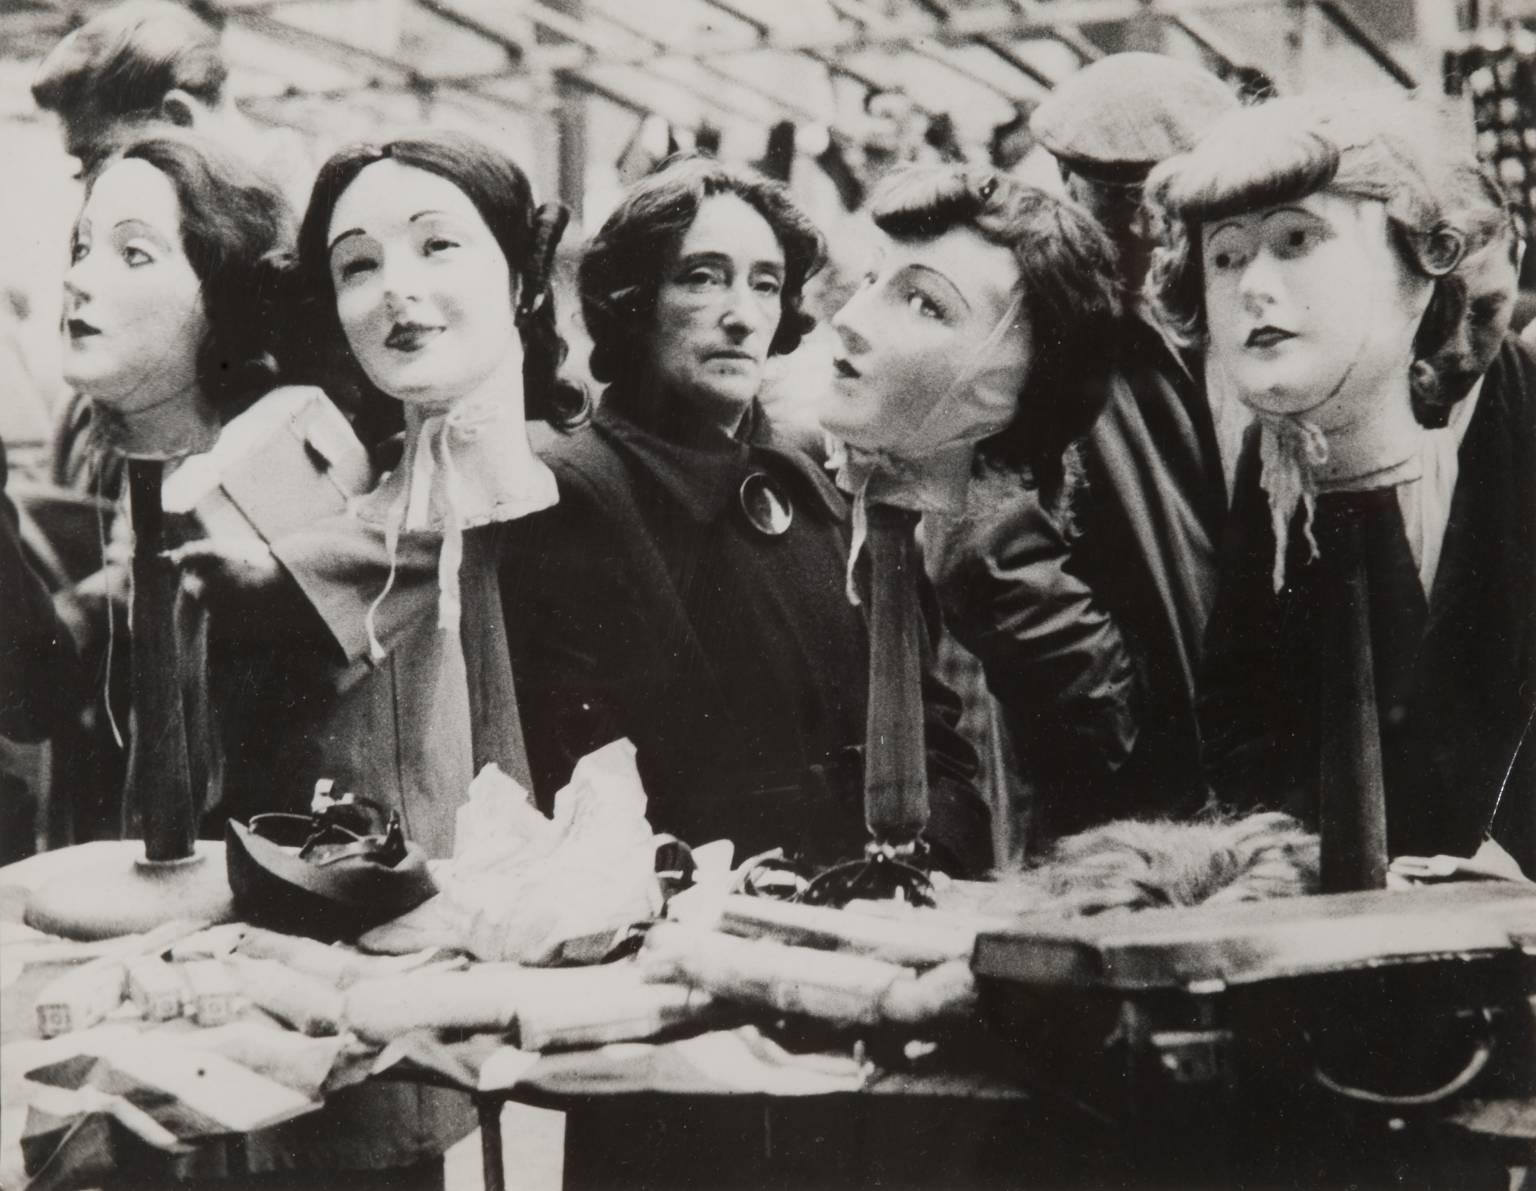 Рынок Петтикот-лэйн. Парик. 1952